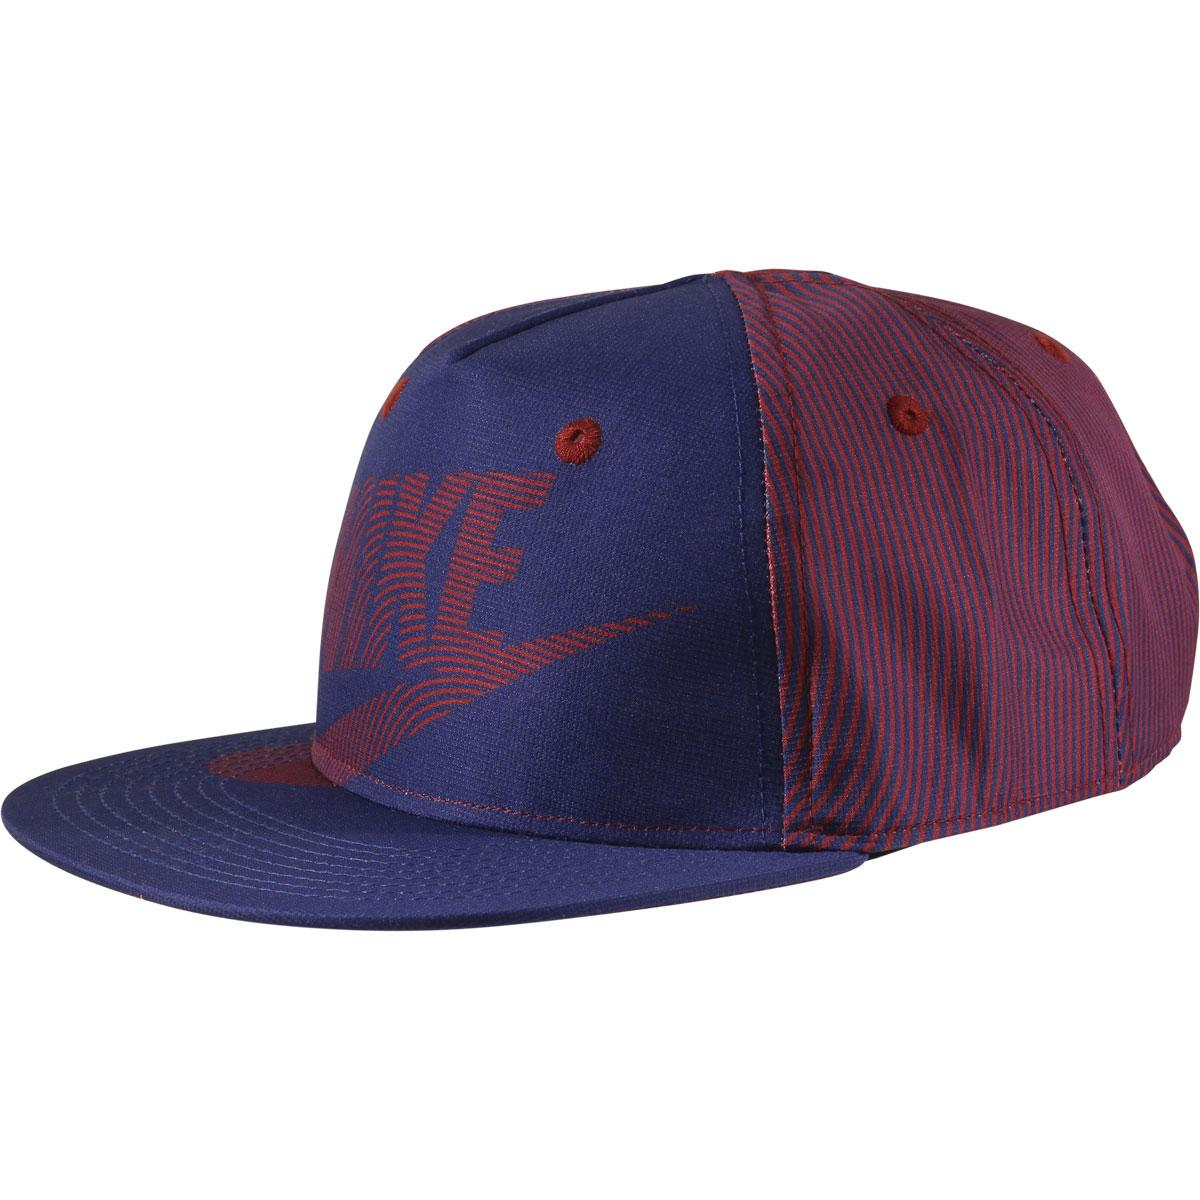 Nike Boy s Futura Print Flat Brim Snapback Baseball Cap Hat Futura Print; 8A2635